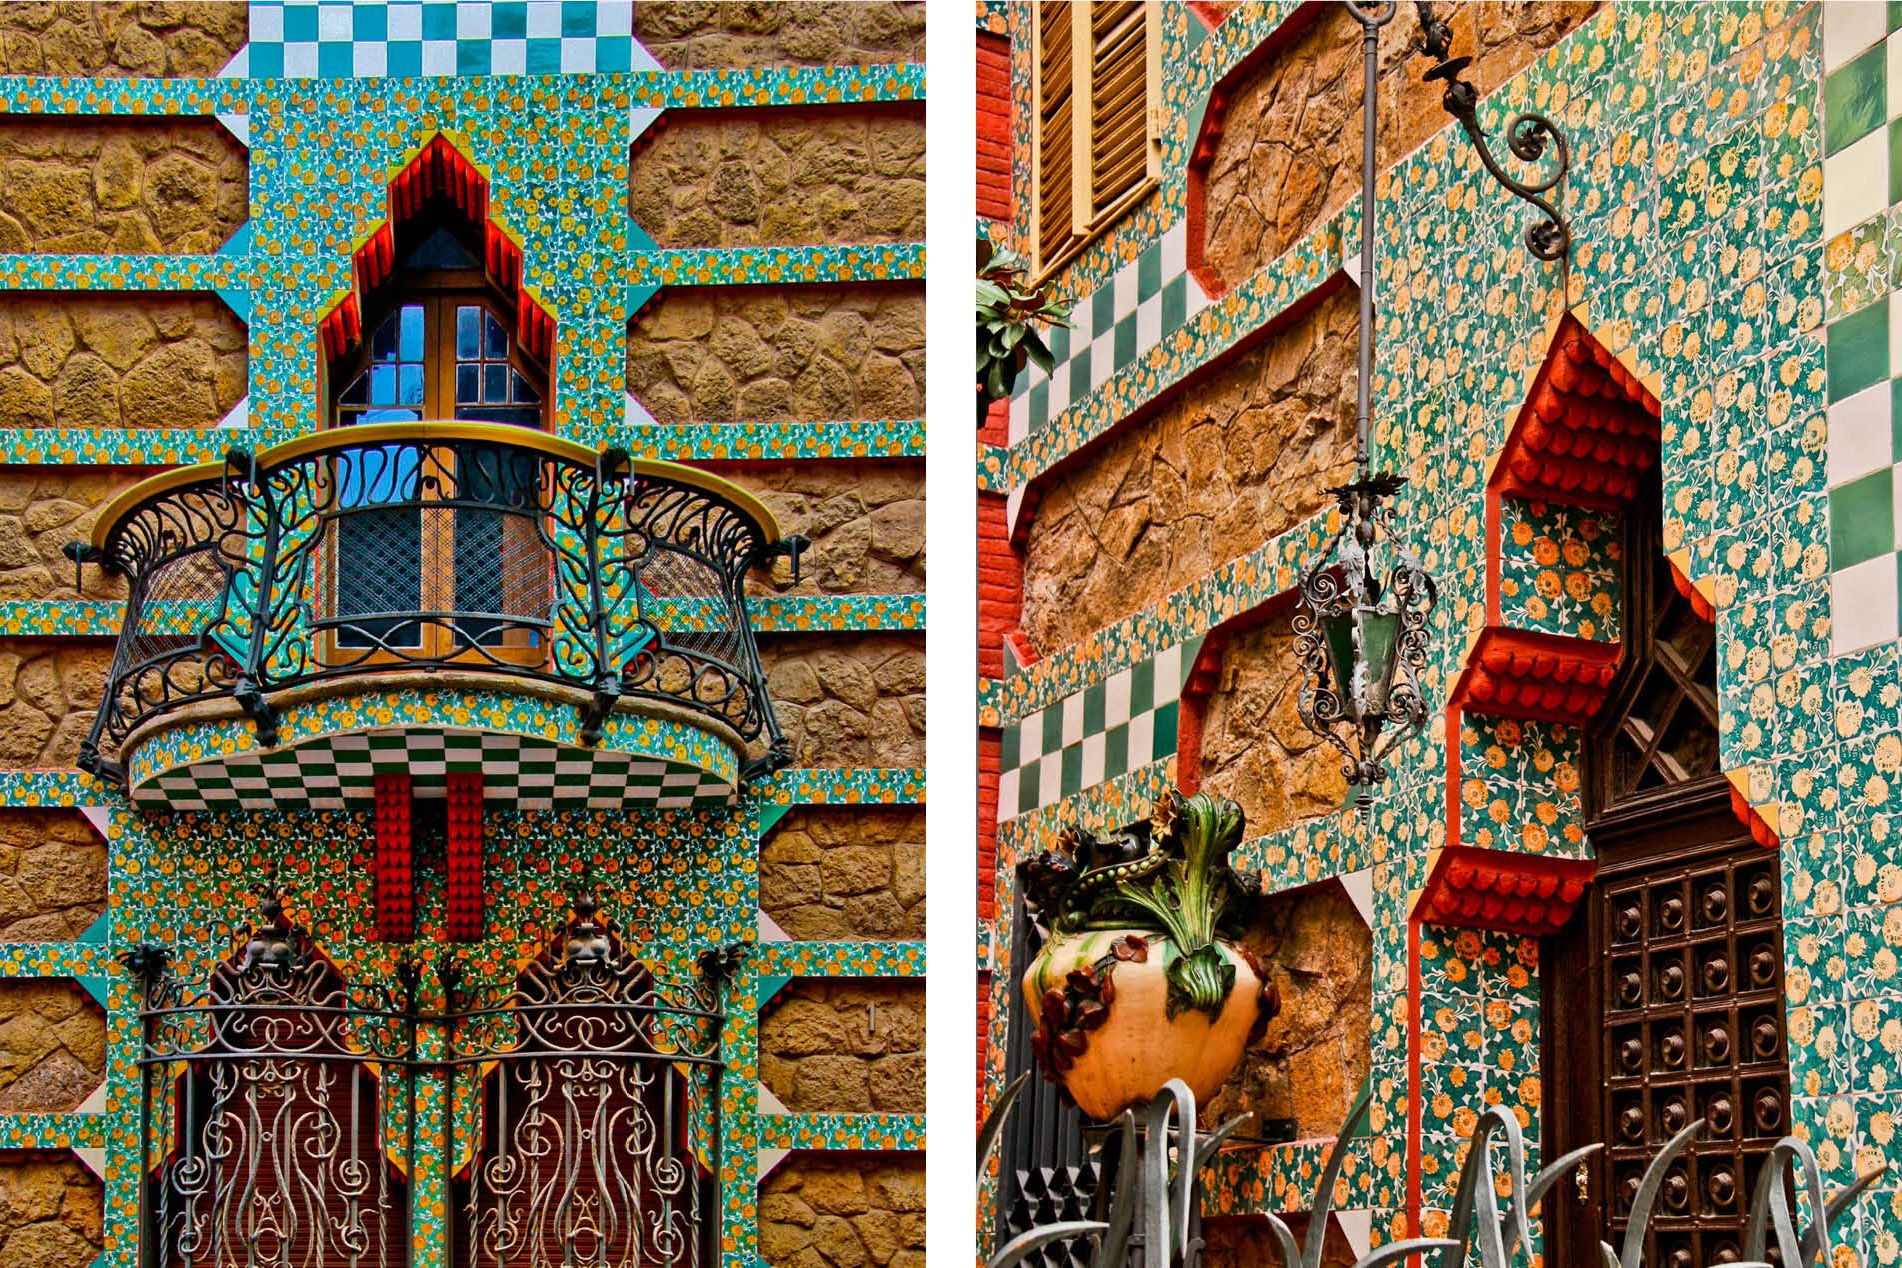 Antonio Gaudi,